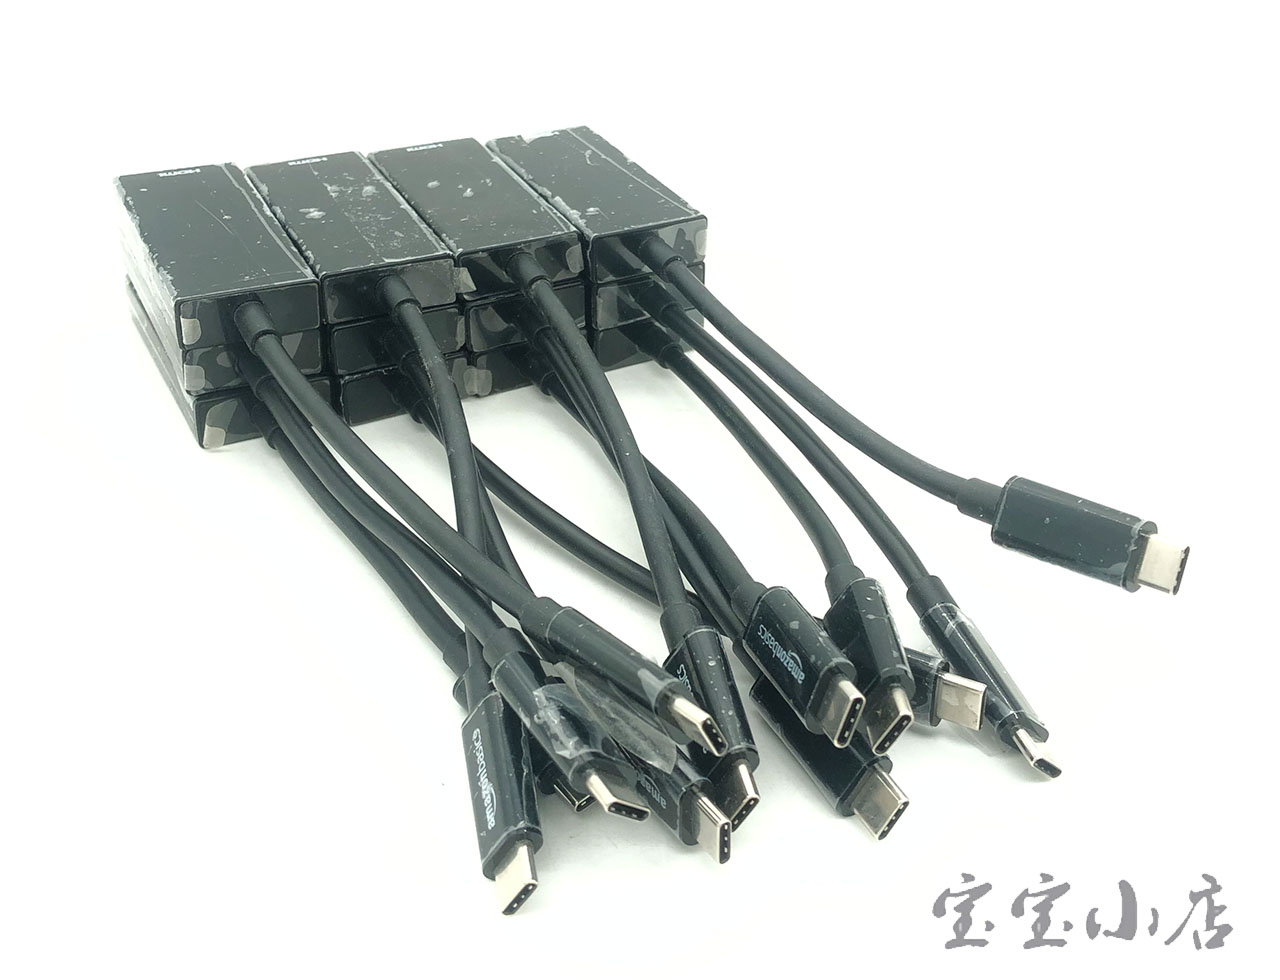 苹果usb c 3.1华为 type c转HDMI 转接头 4k高清转换器AmazonBasics USB 3.1 Type-C to HDMI Adapter Black